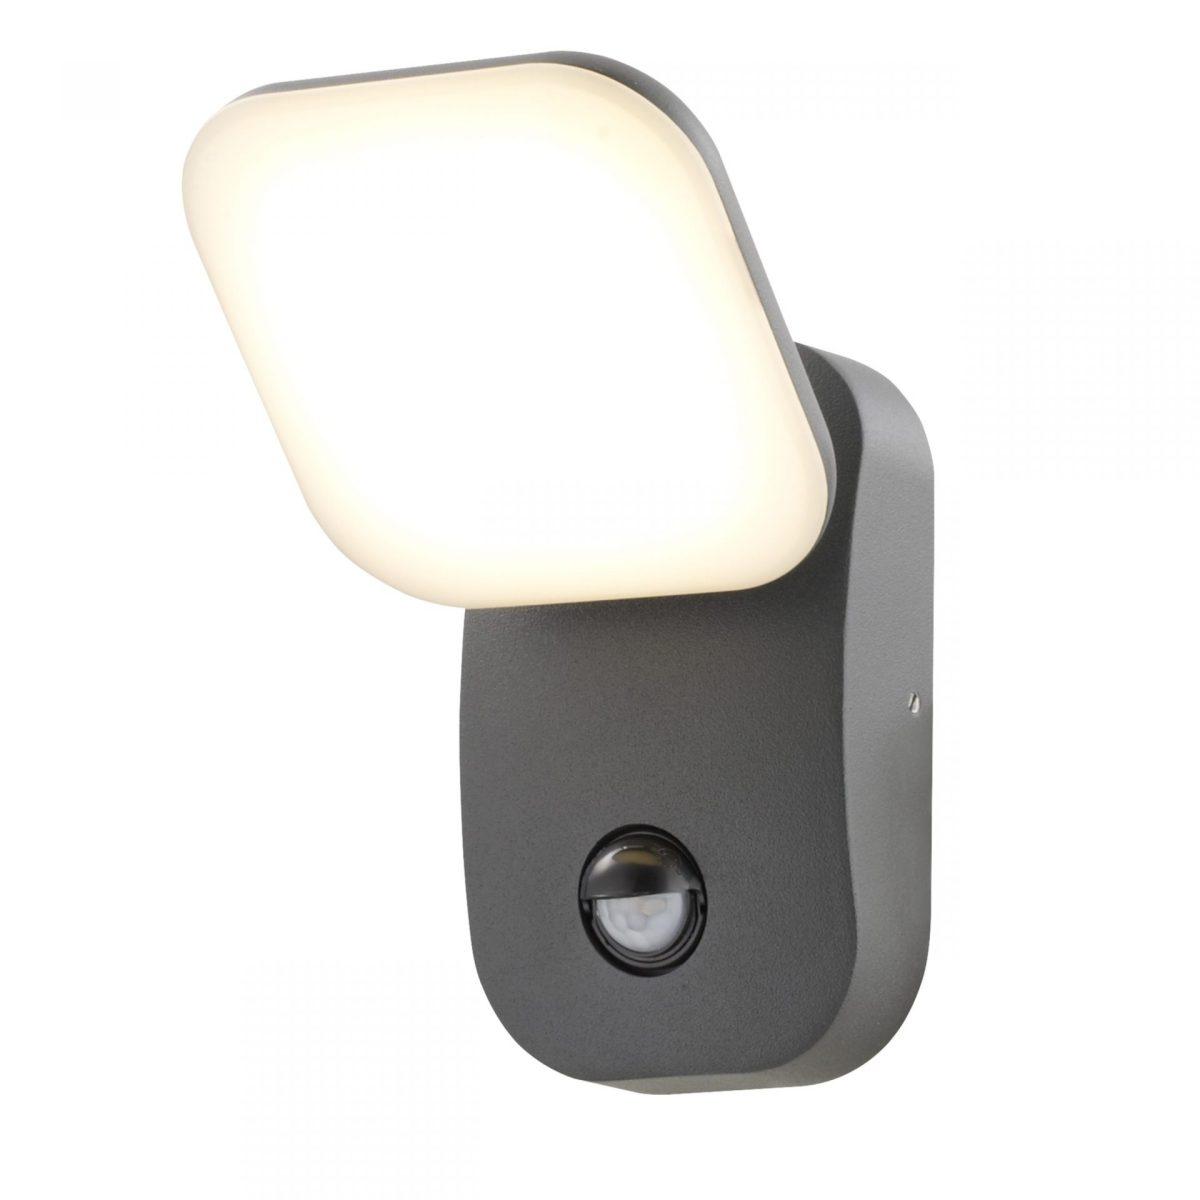 Outdoor Lighting Floodlights WL-L8 SENSOR – COMING SOON